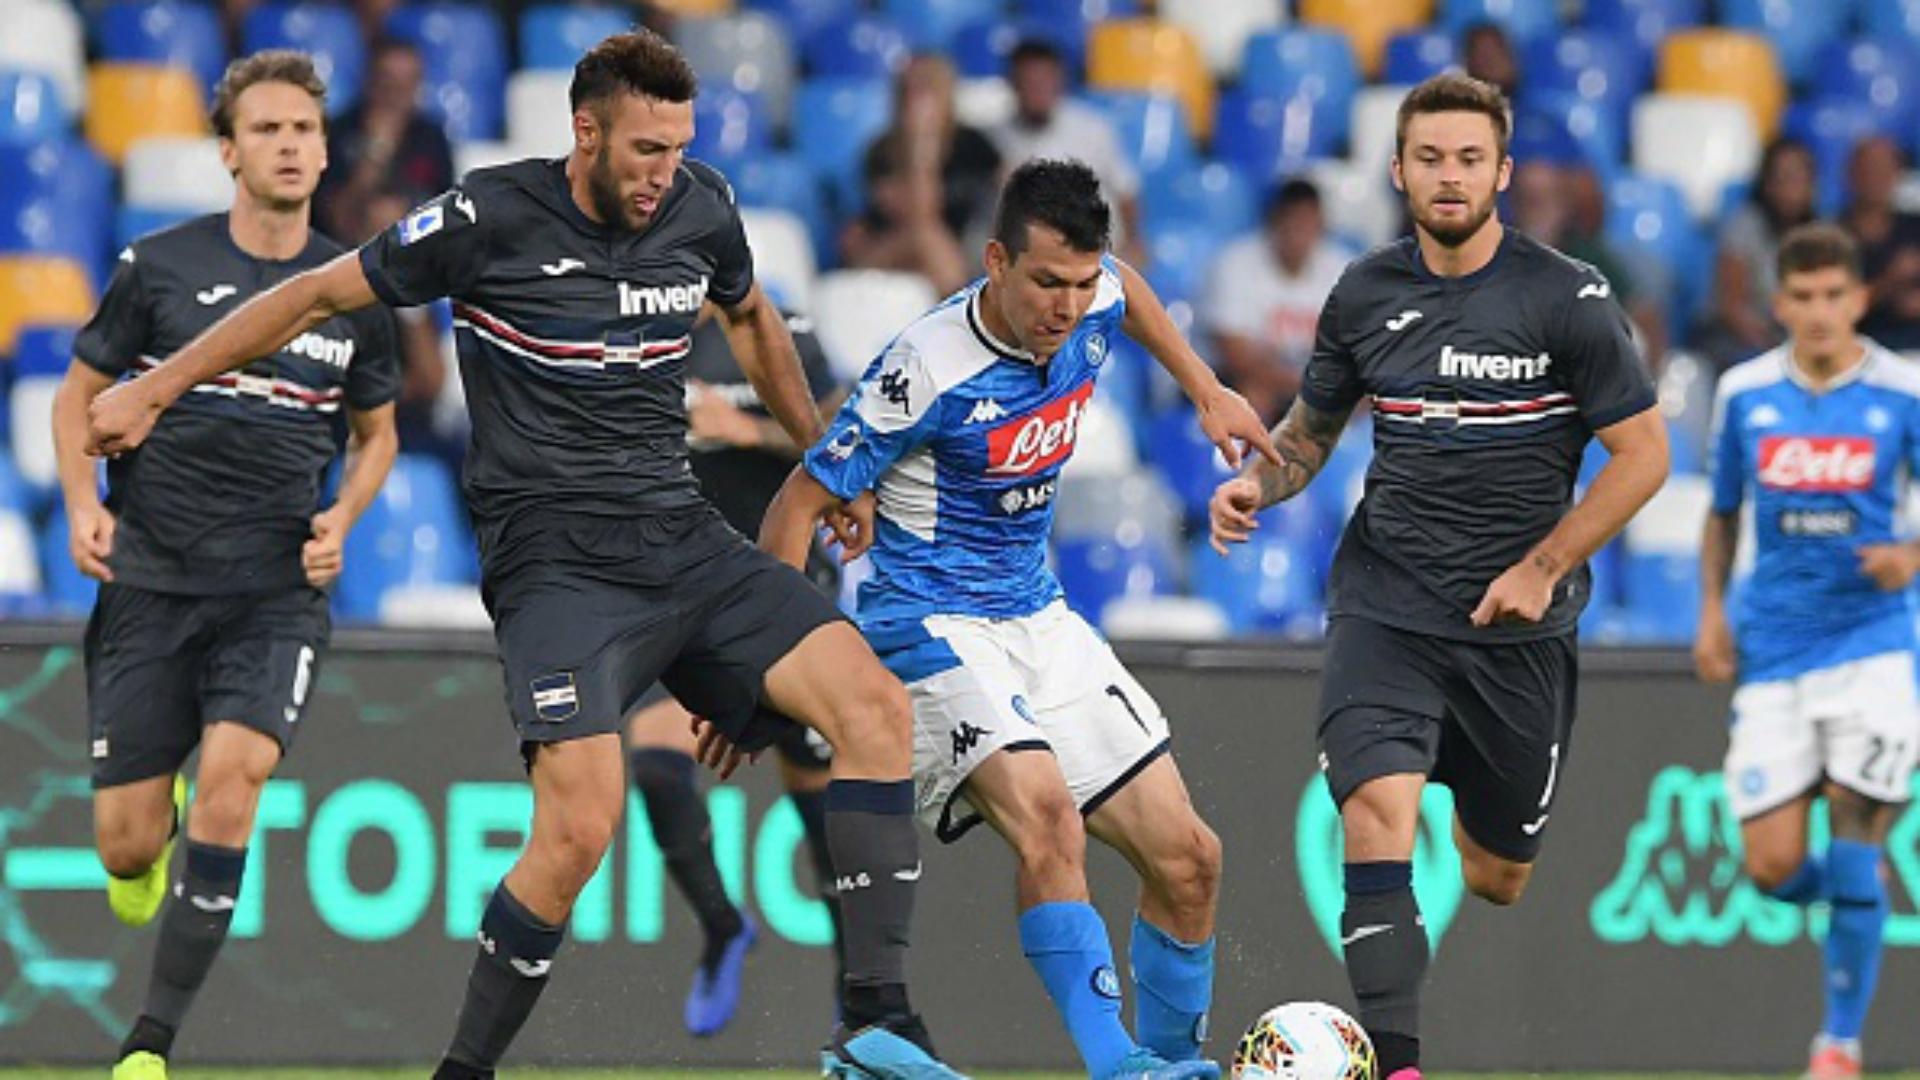 Lozano Napoli - Sampdoria